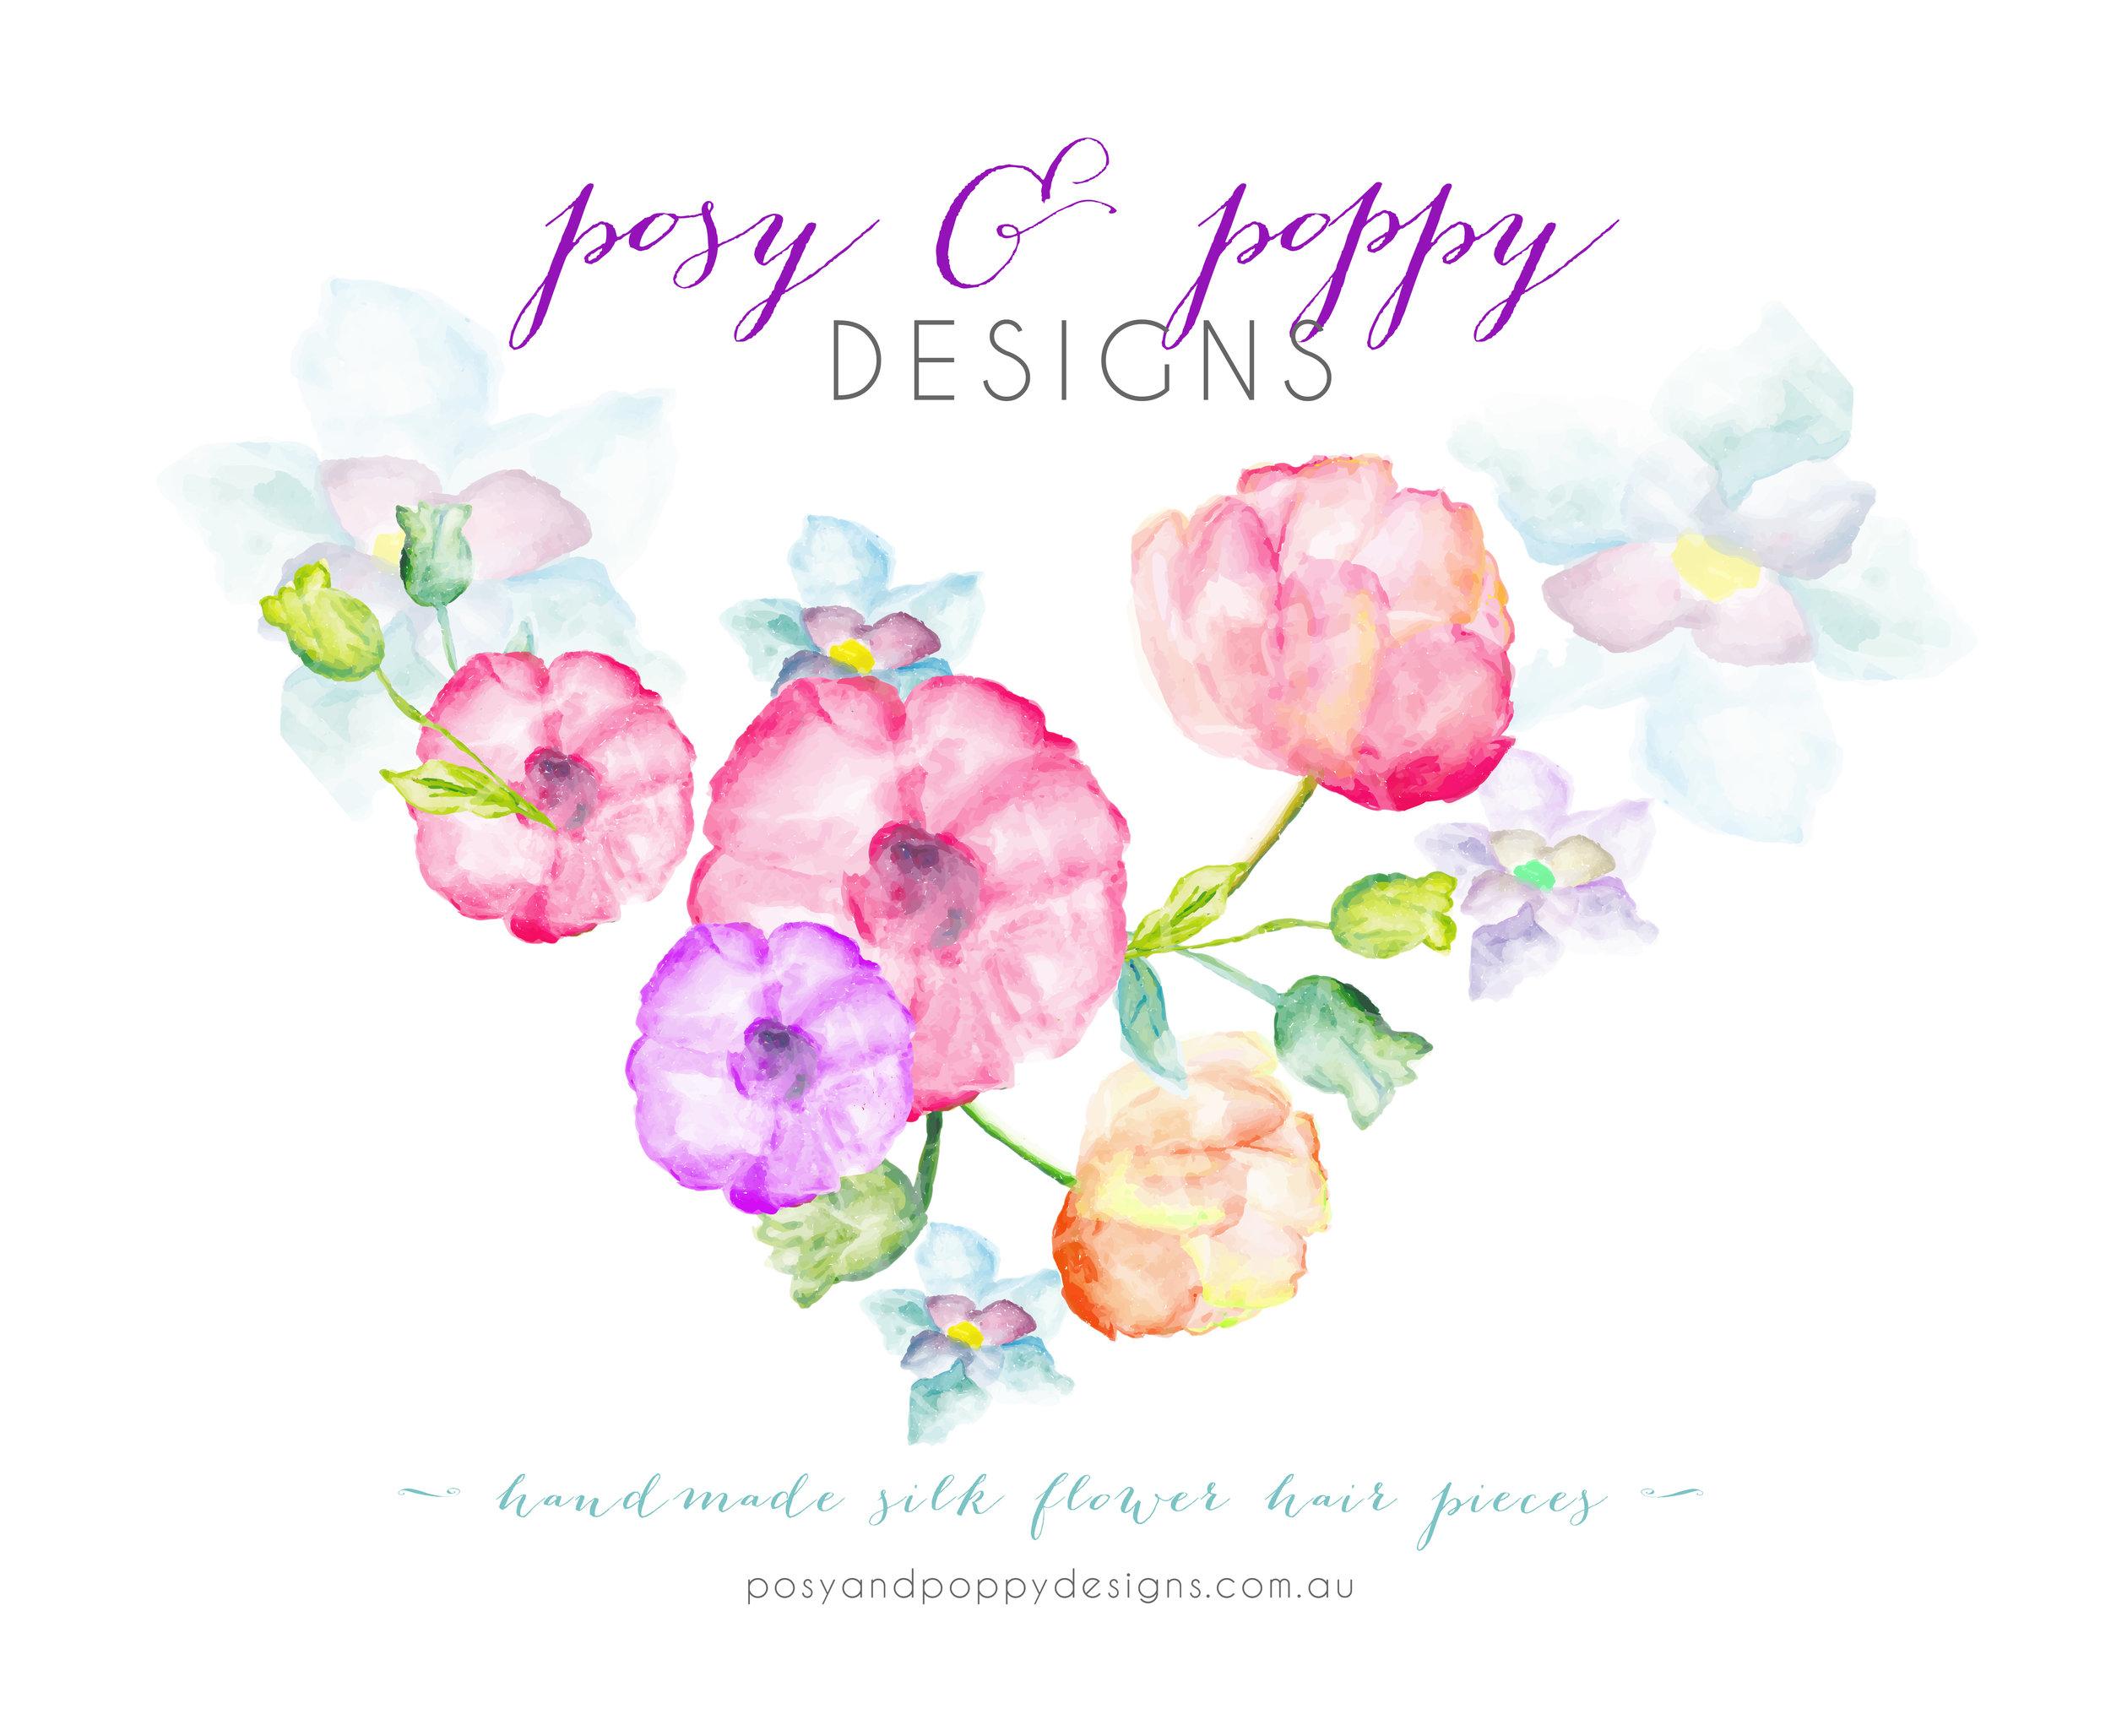 Posy and poppy final logo (high resolution) JPG new.jpg